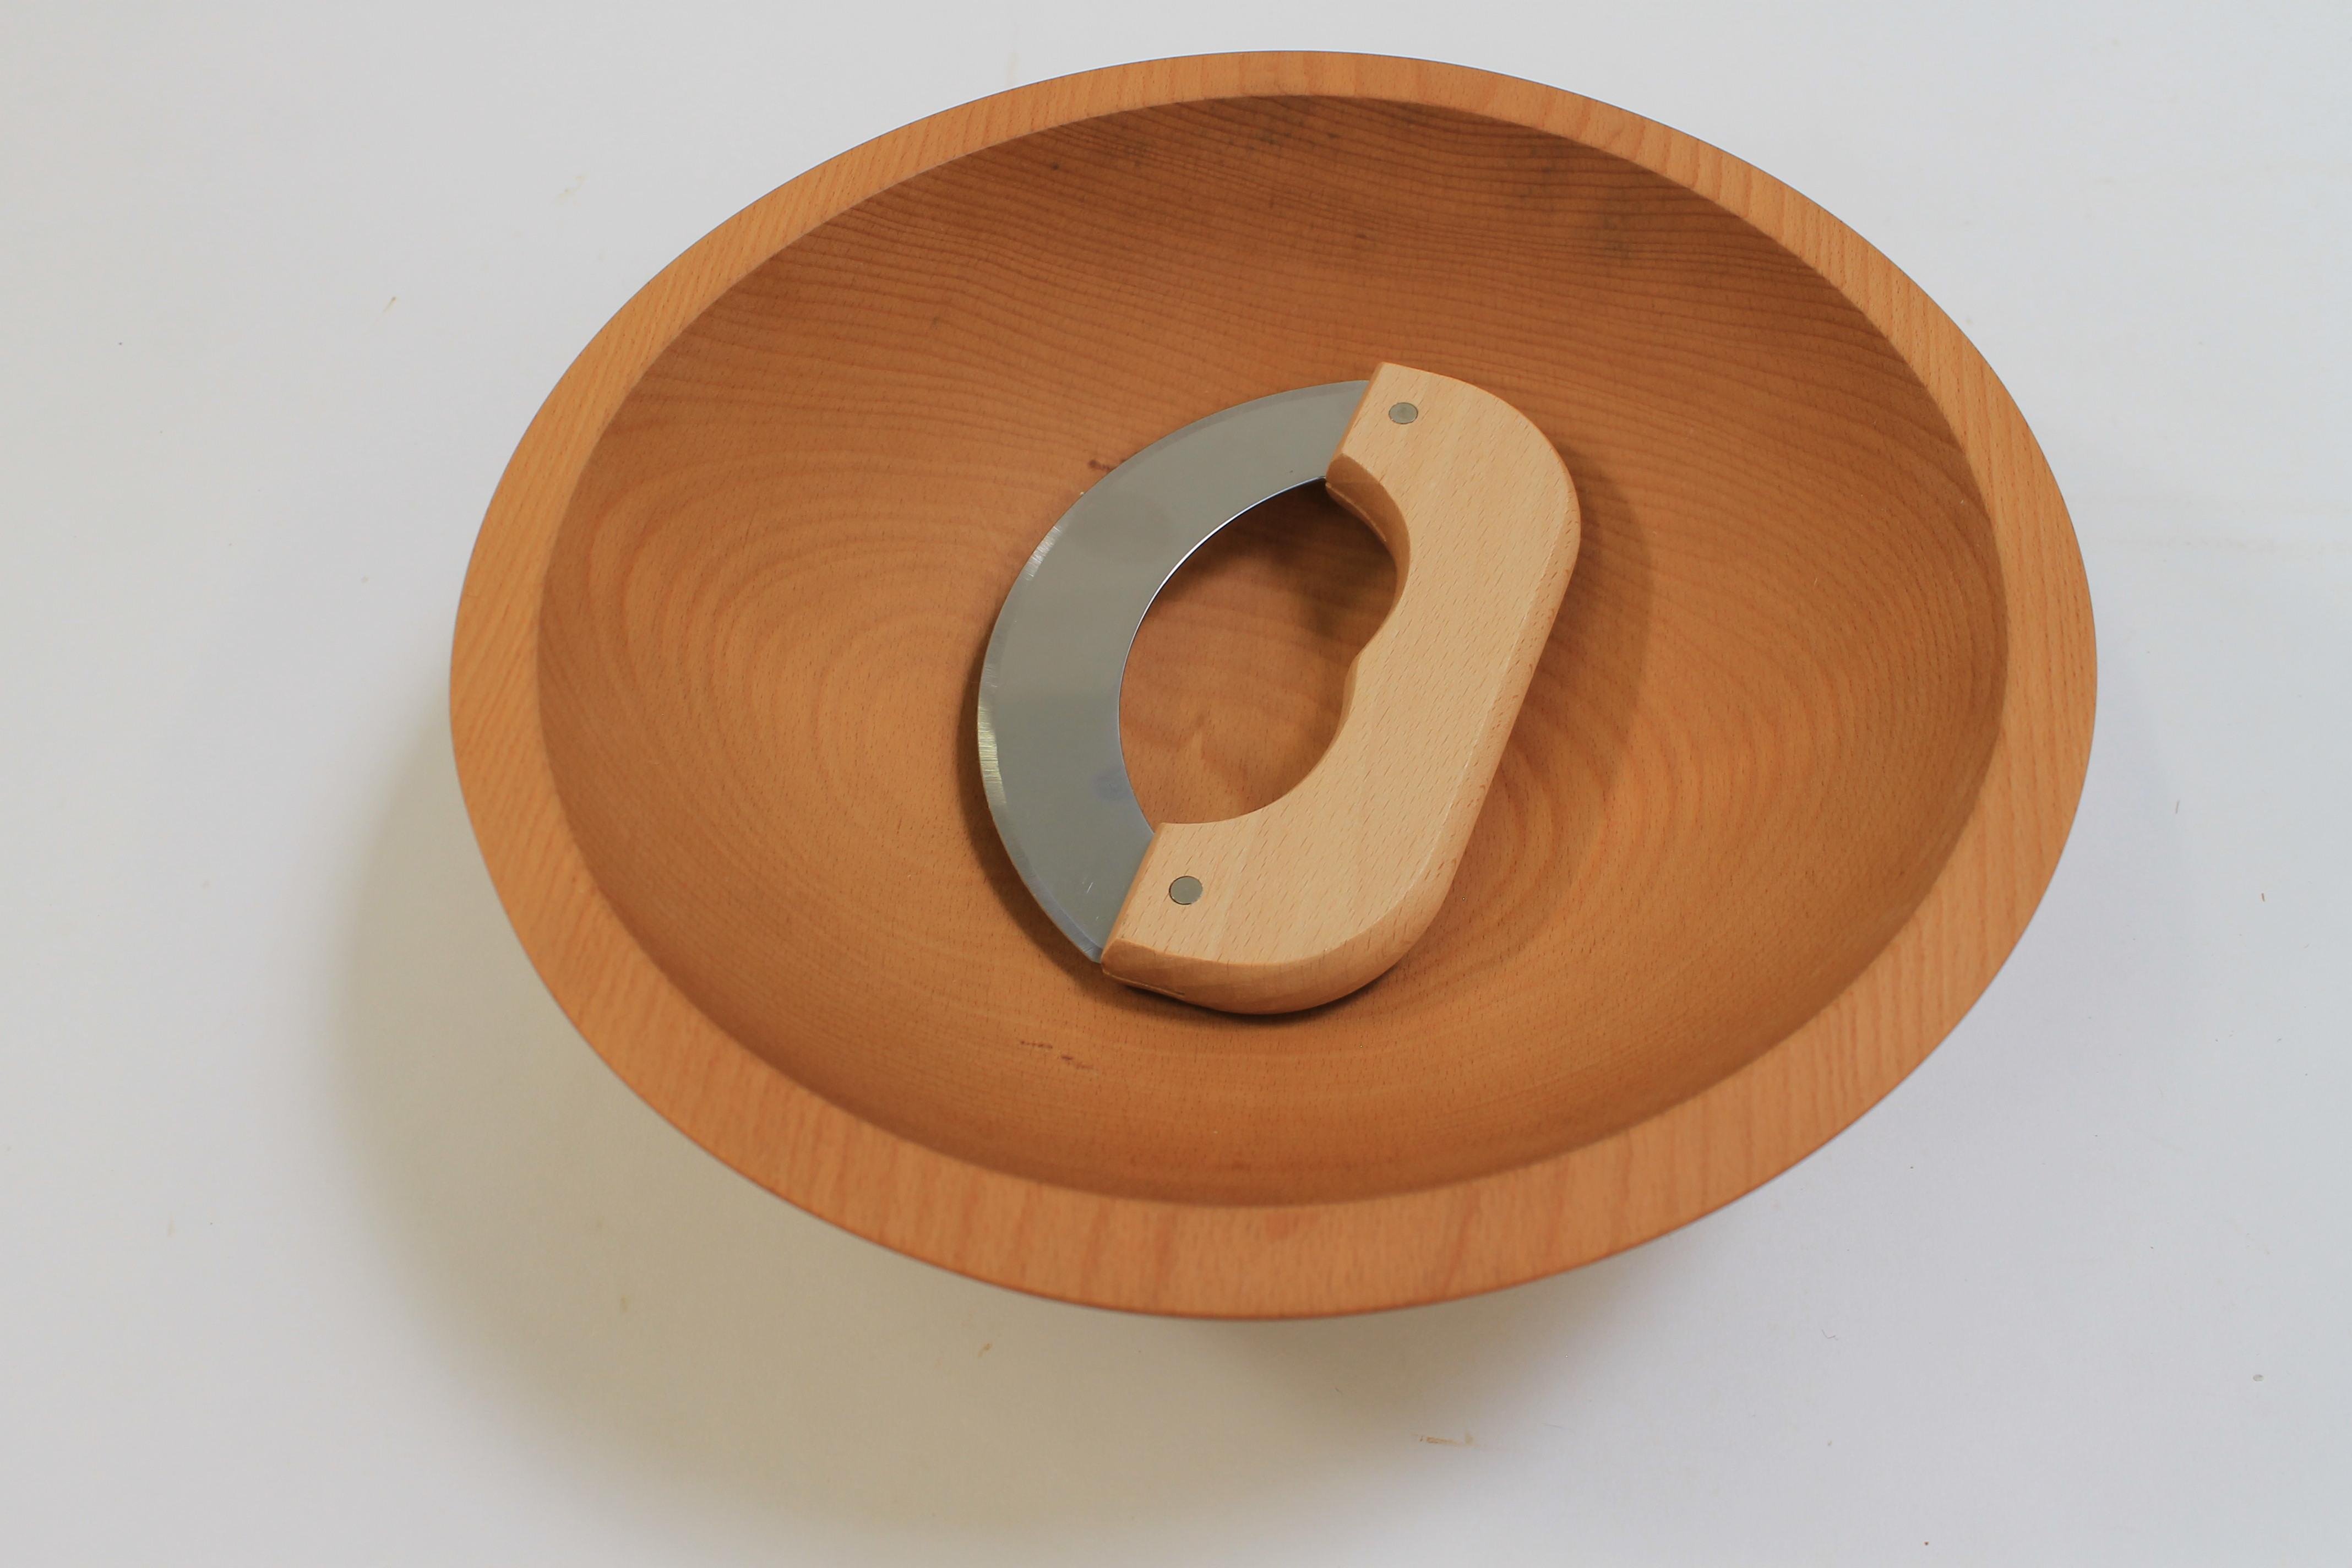 12 inch Beech Wood Chopping Bowl & Mezzaluna Knife Set - Bee's Oil Finish 112CB